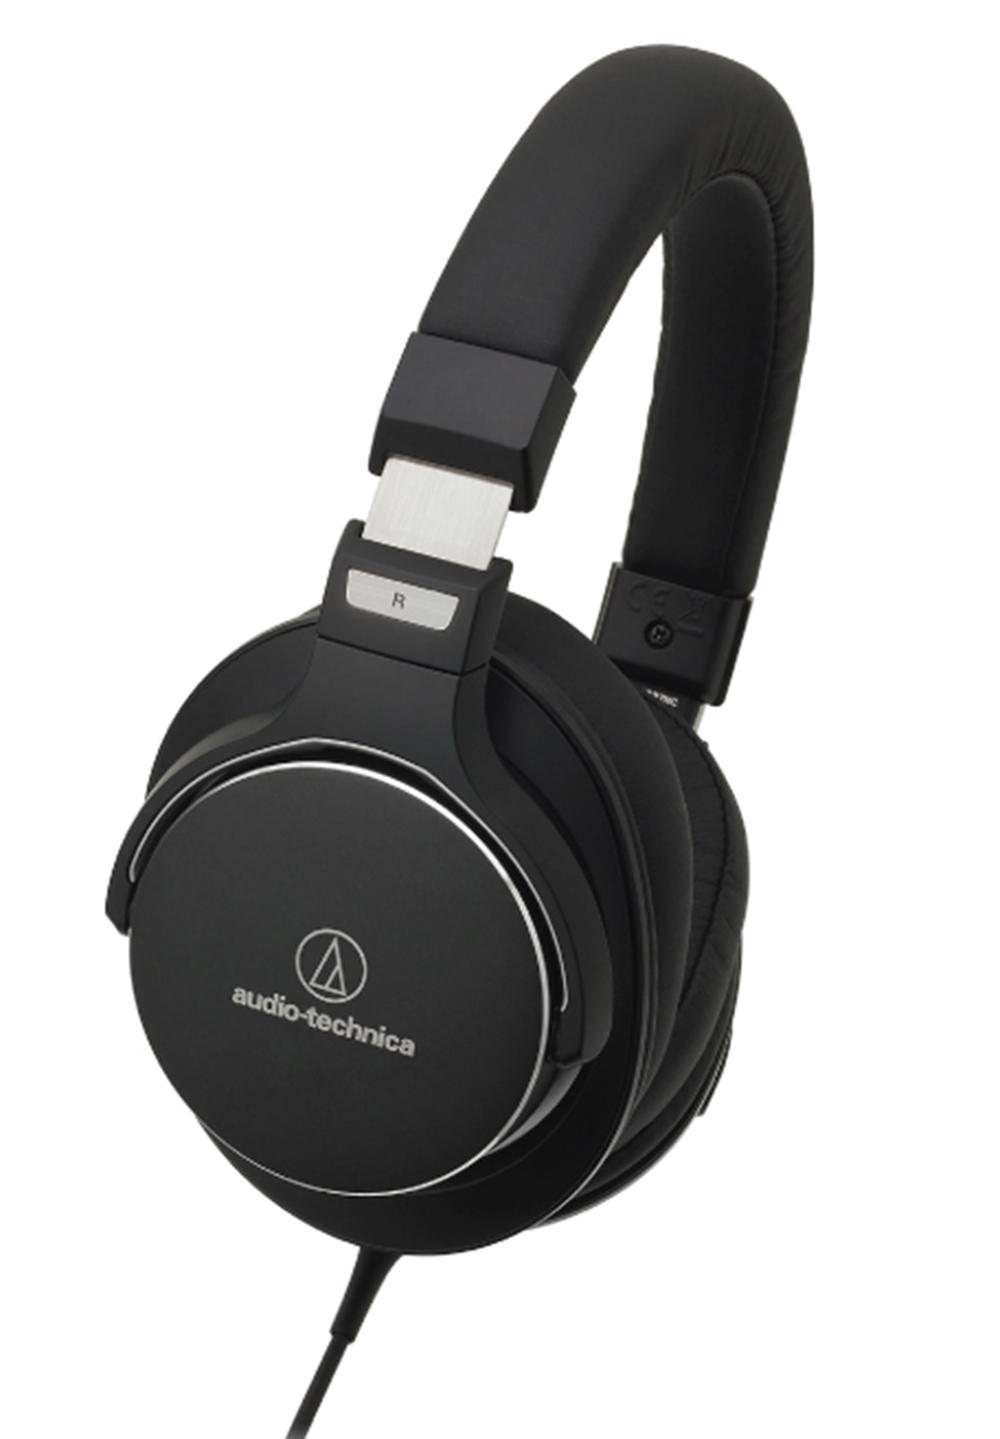 Audio-Technica ATH-MSR7NC SonicPro Headphones